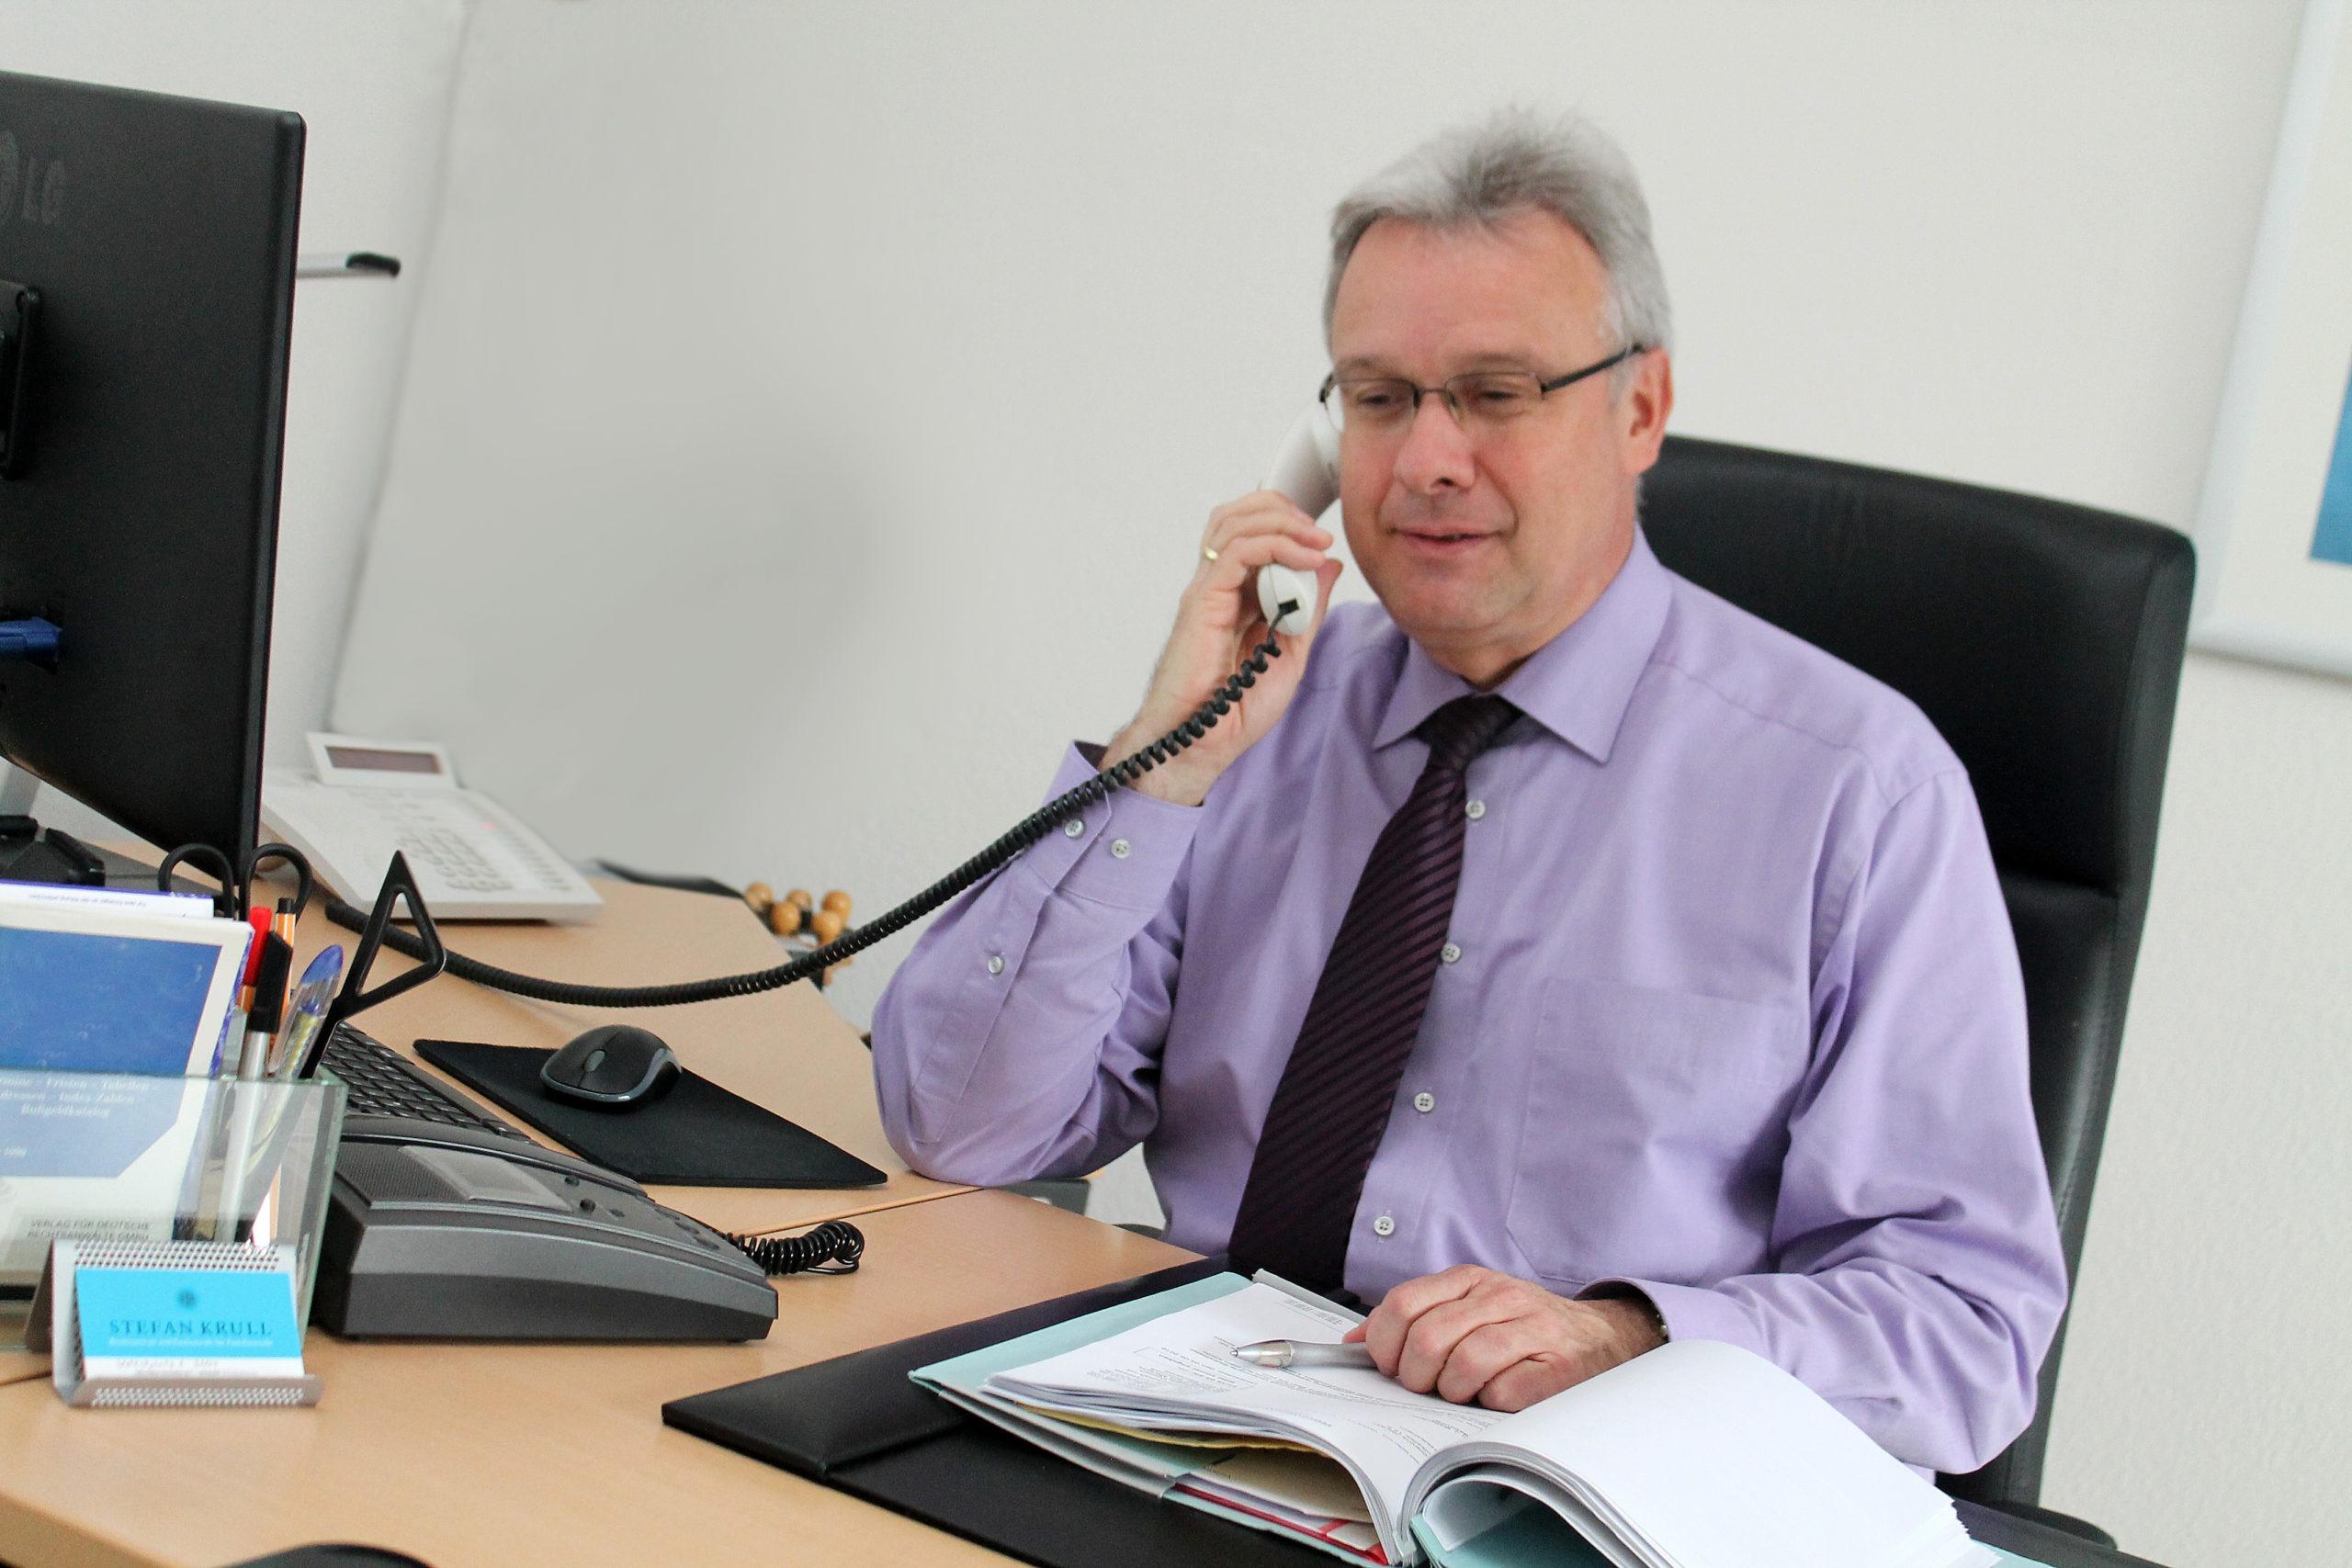 Rechtsanwalt Stefan Krull Fachanwalt für Familienrecht Hildesheim